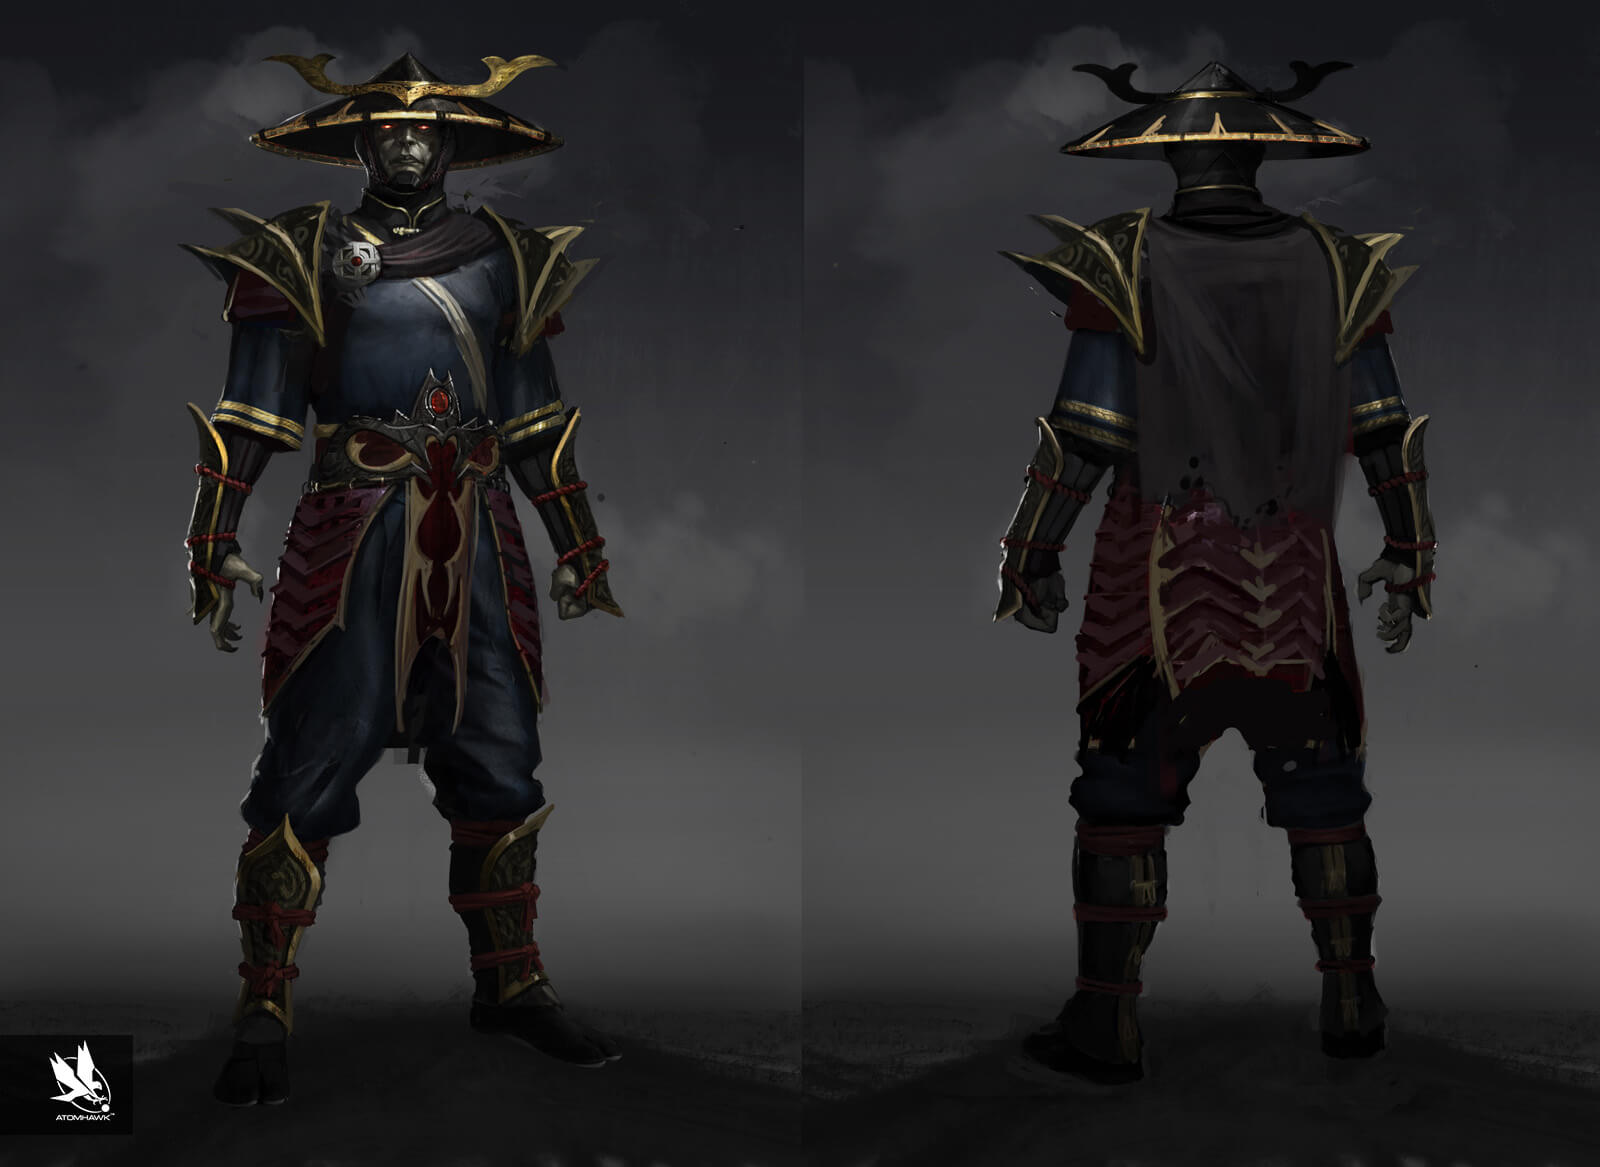 Mortal Kombat X Atomhawk We Bring Ideas To Life